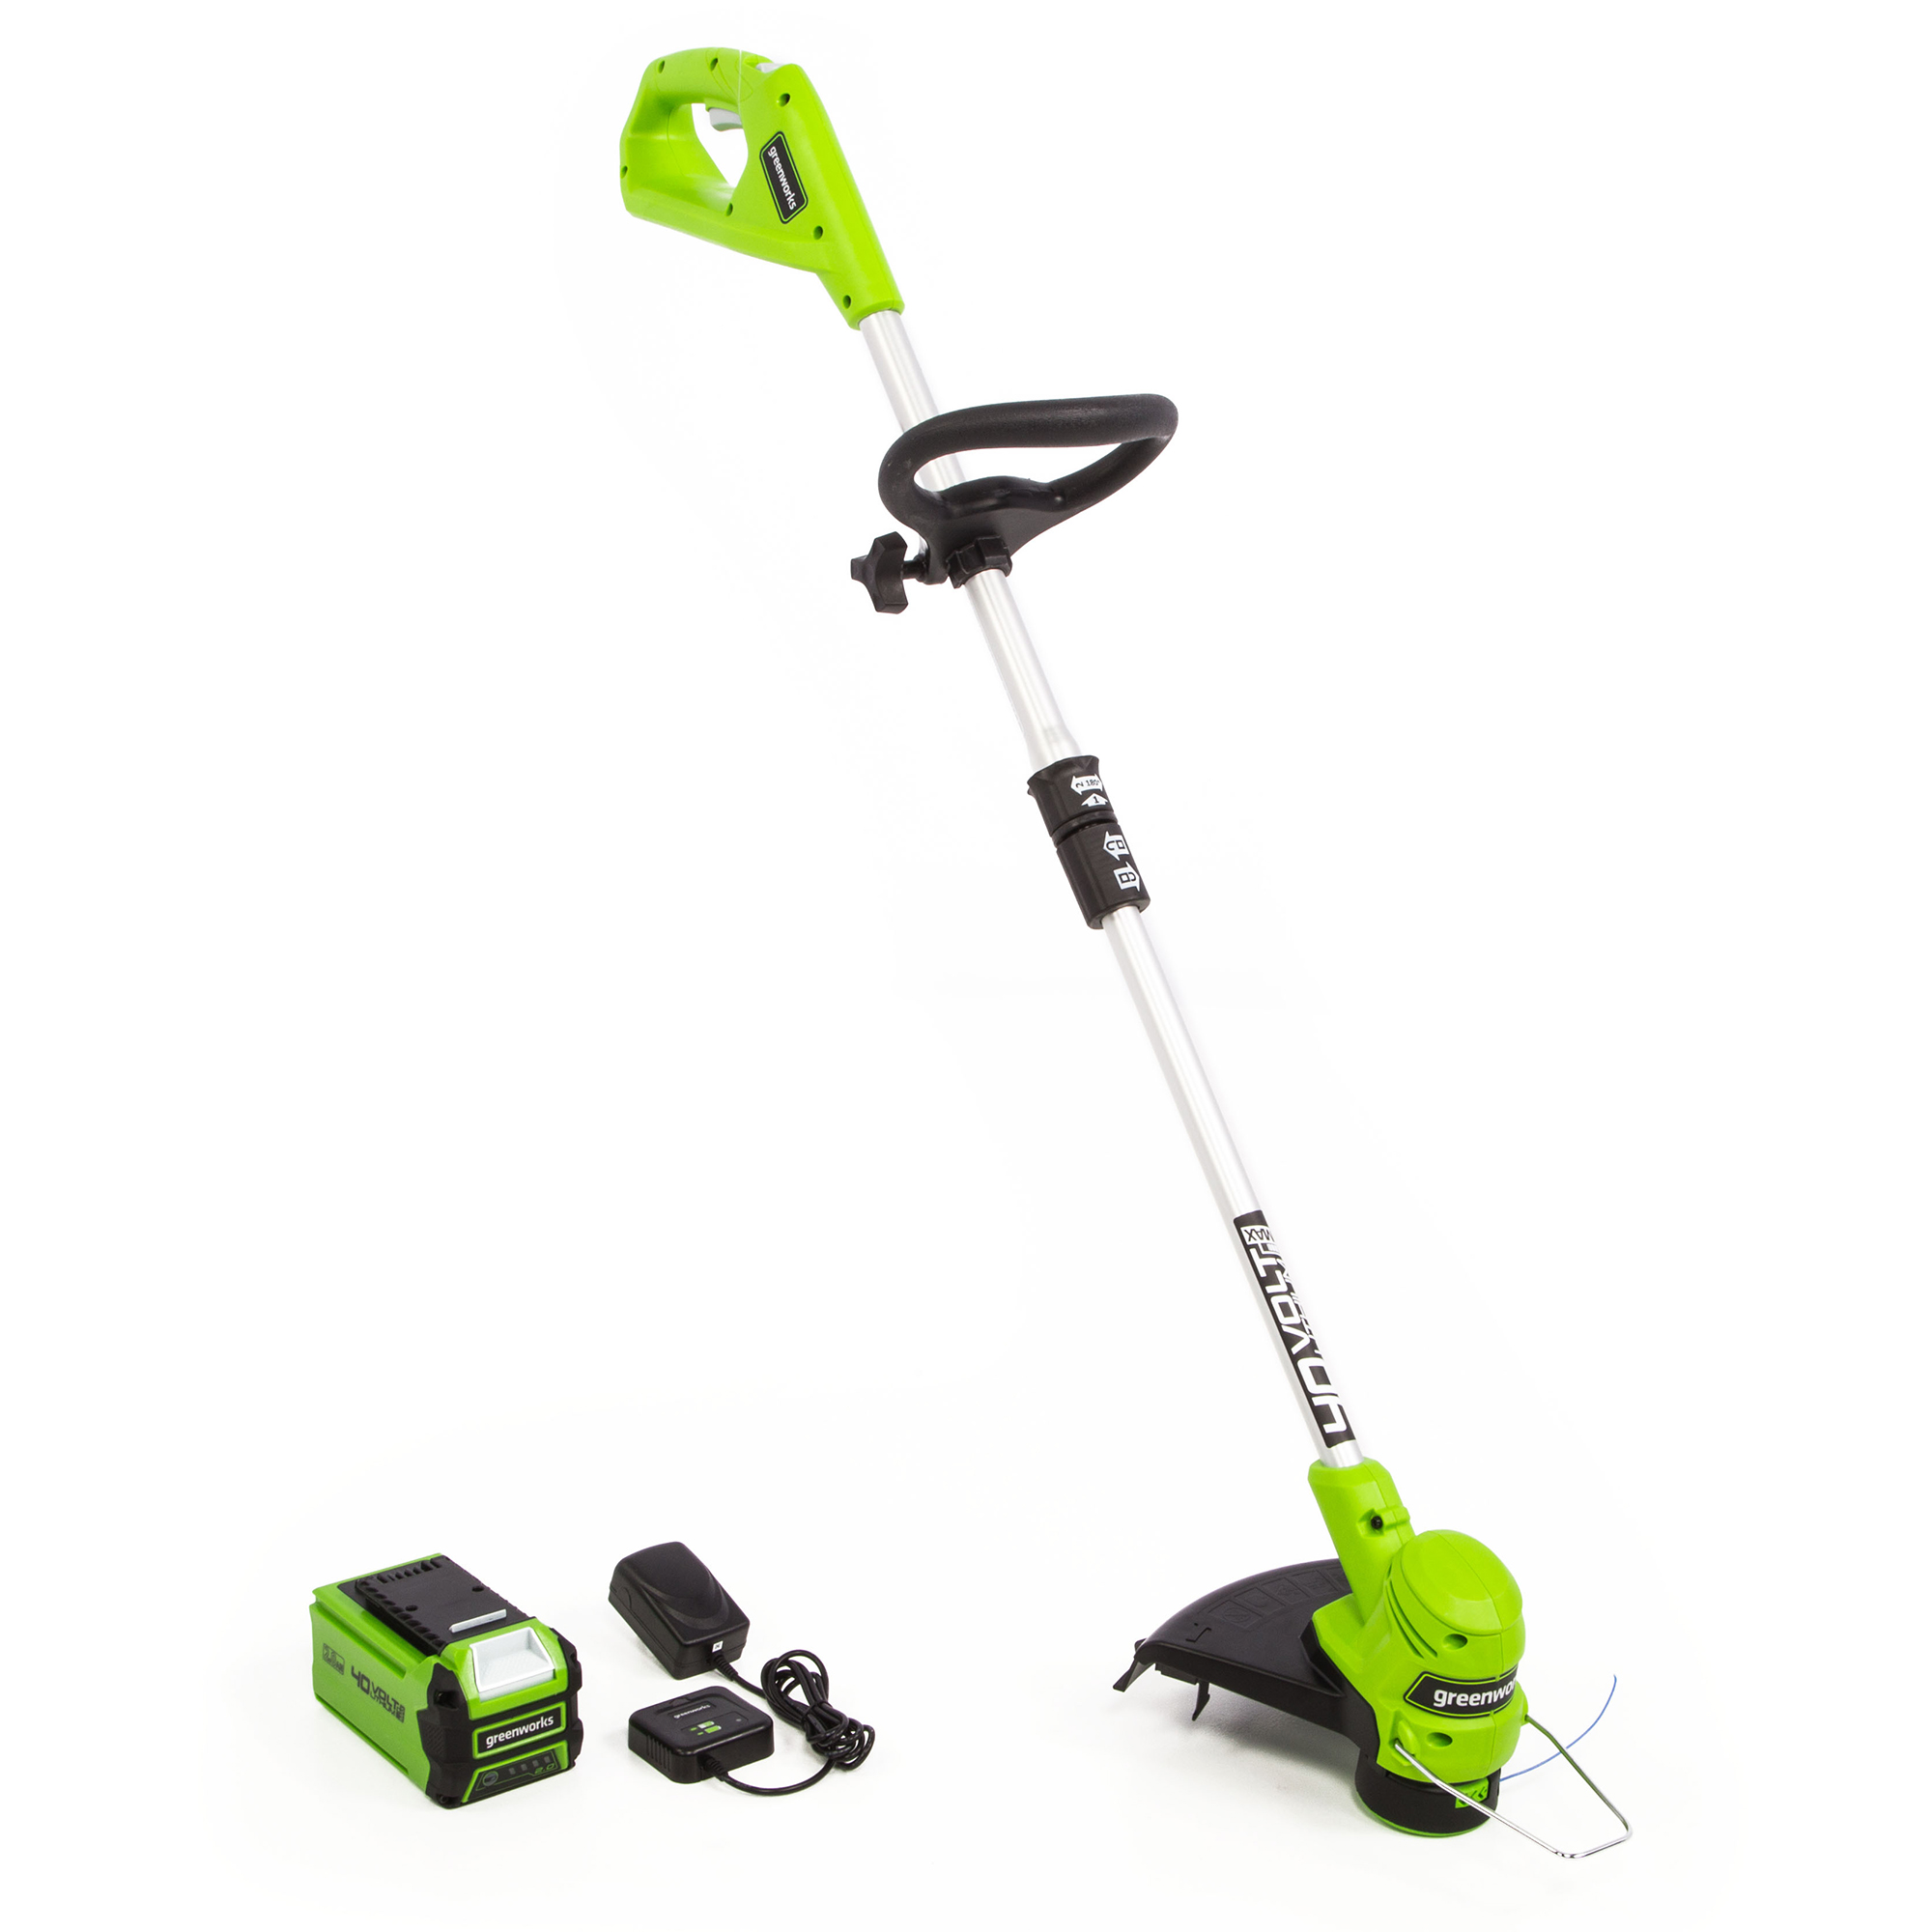 WARN 69212 Replacement Plow Skids